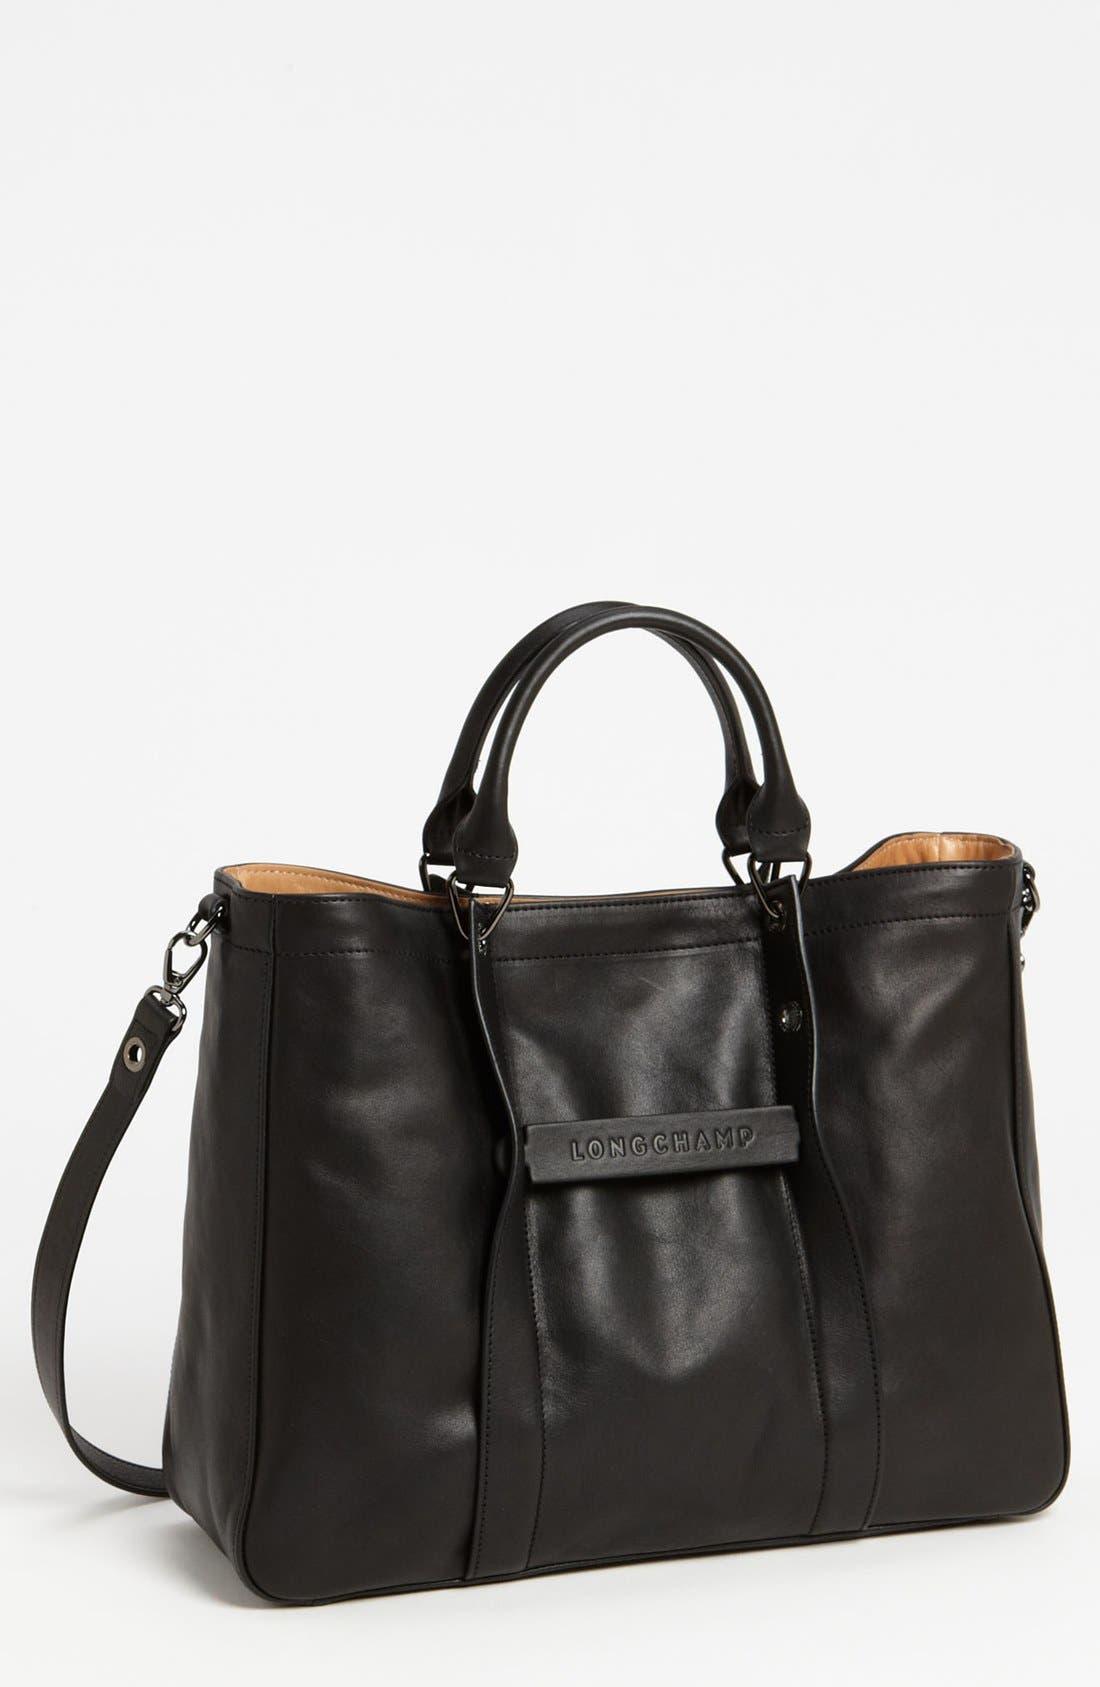 Main Image - Longchamp '3D - Large' Leather Tote